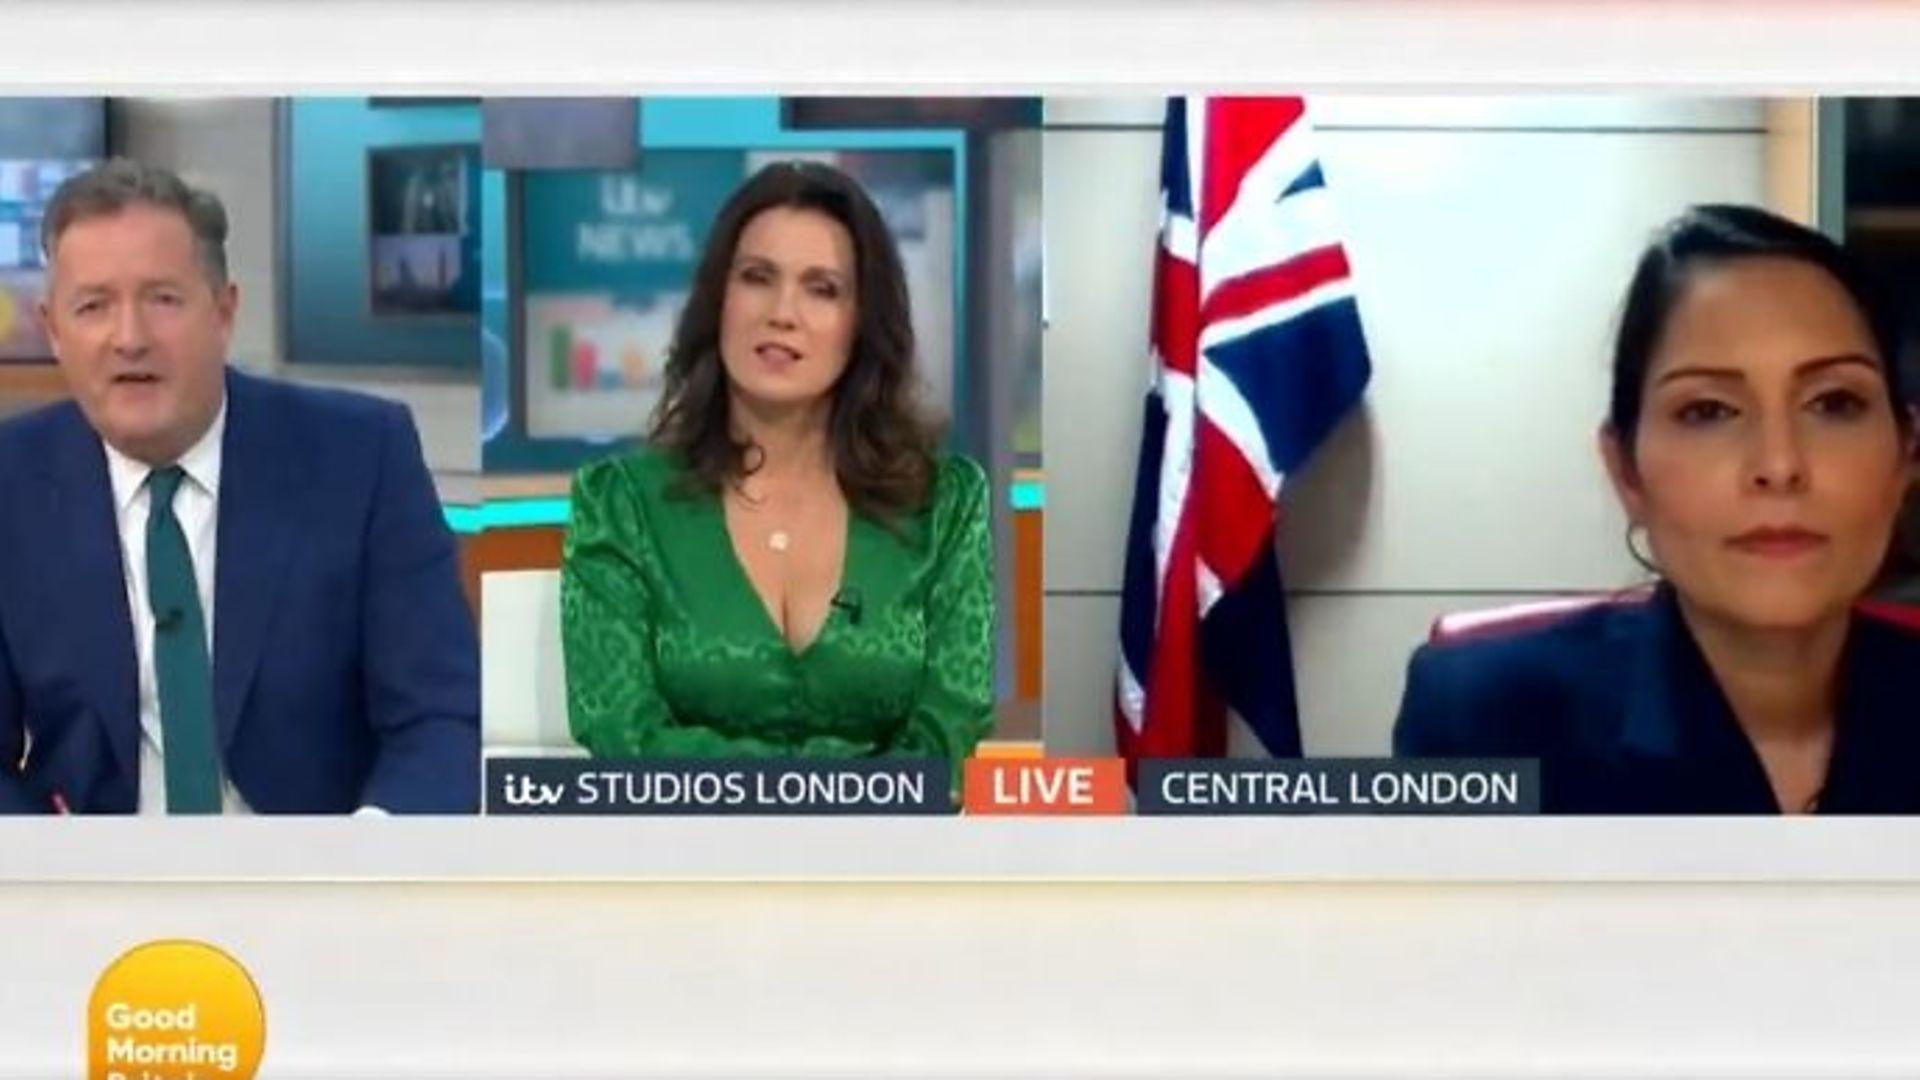 Piers Morgan (L), Susanna Reid (M) and Priti Patel on Good Morning Britain - Credit: Twitter